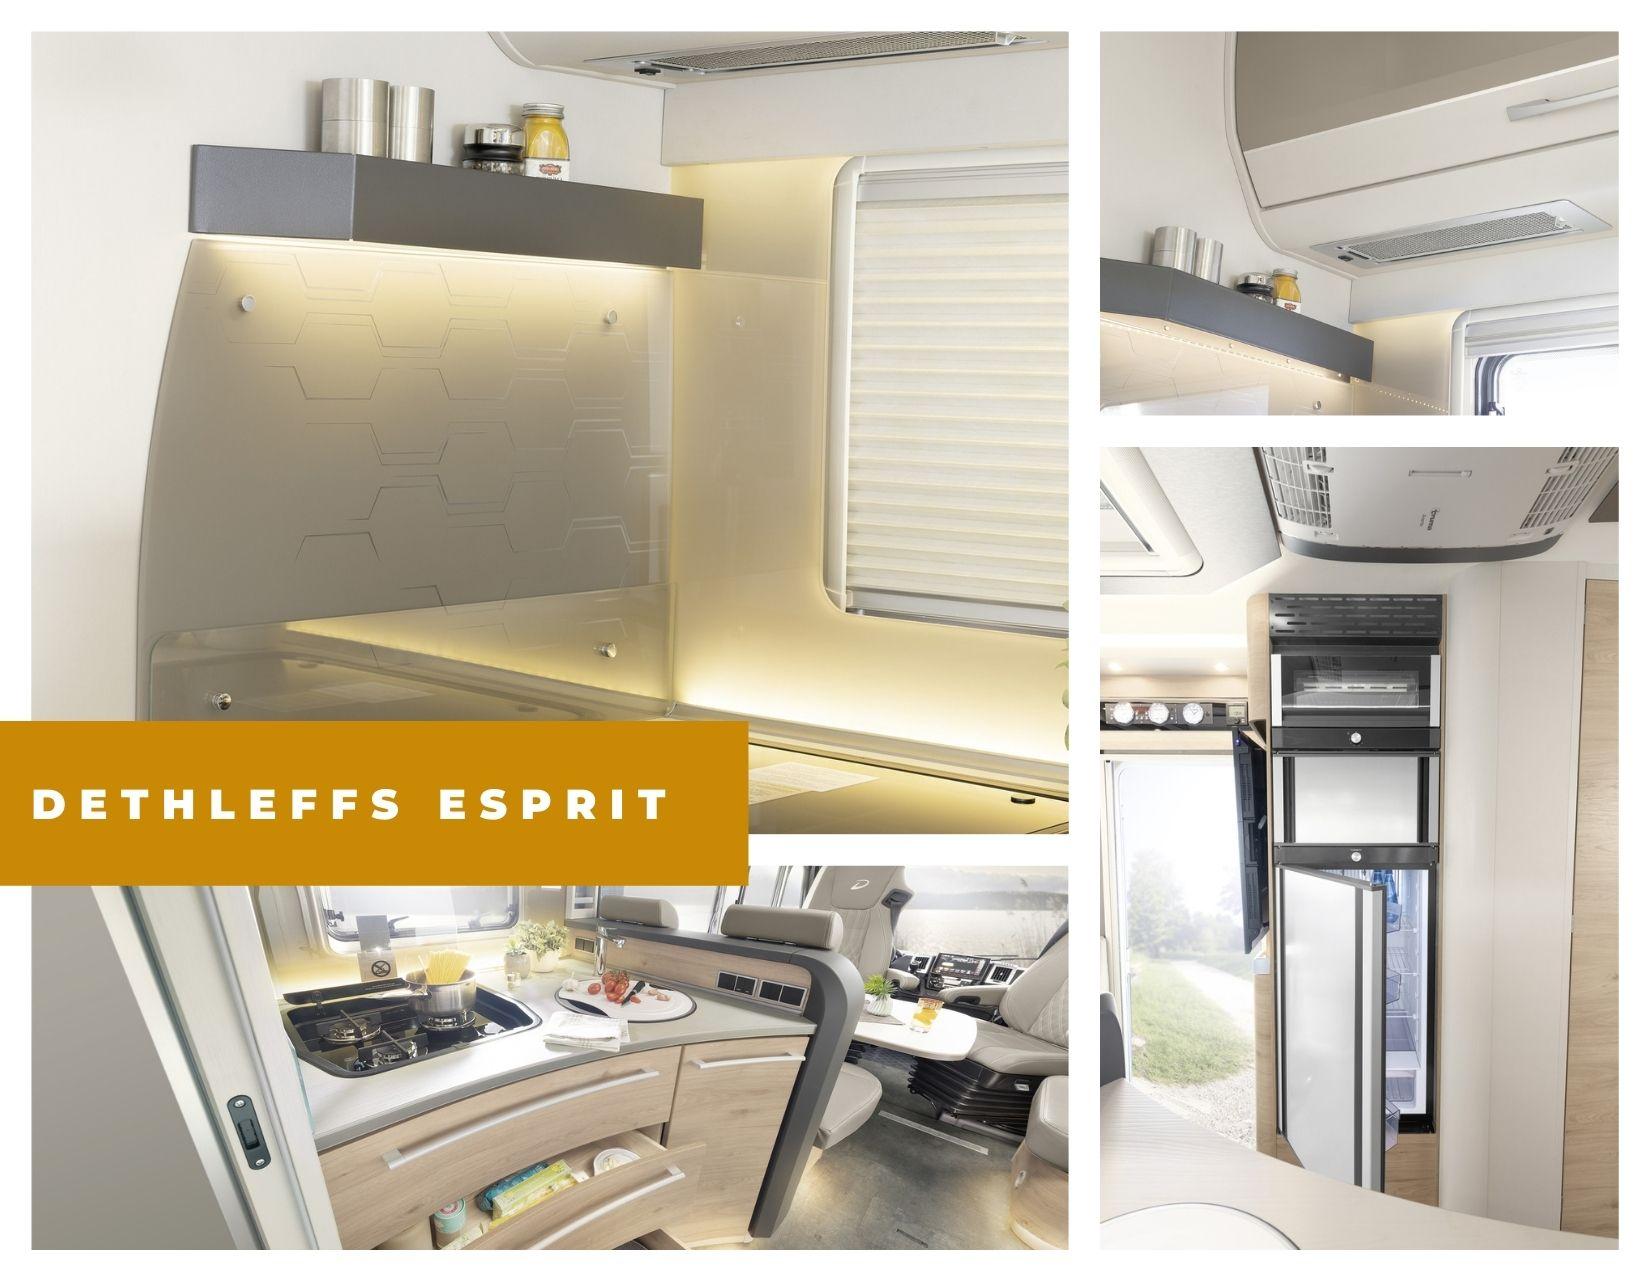 Dethleffs Esprit cocina